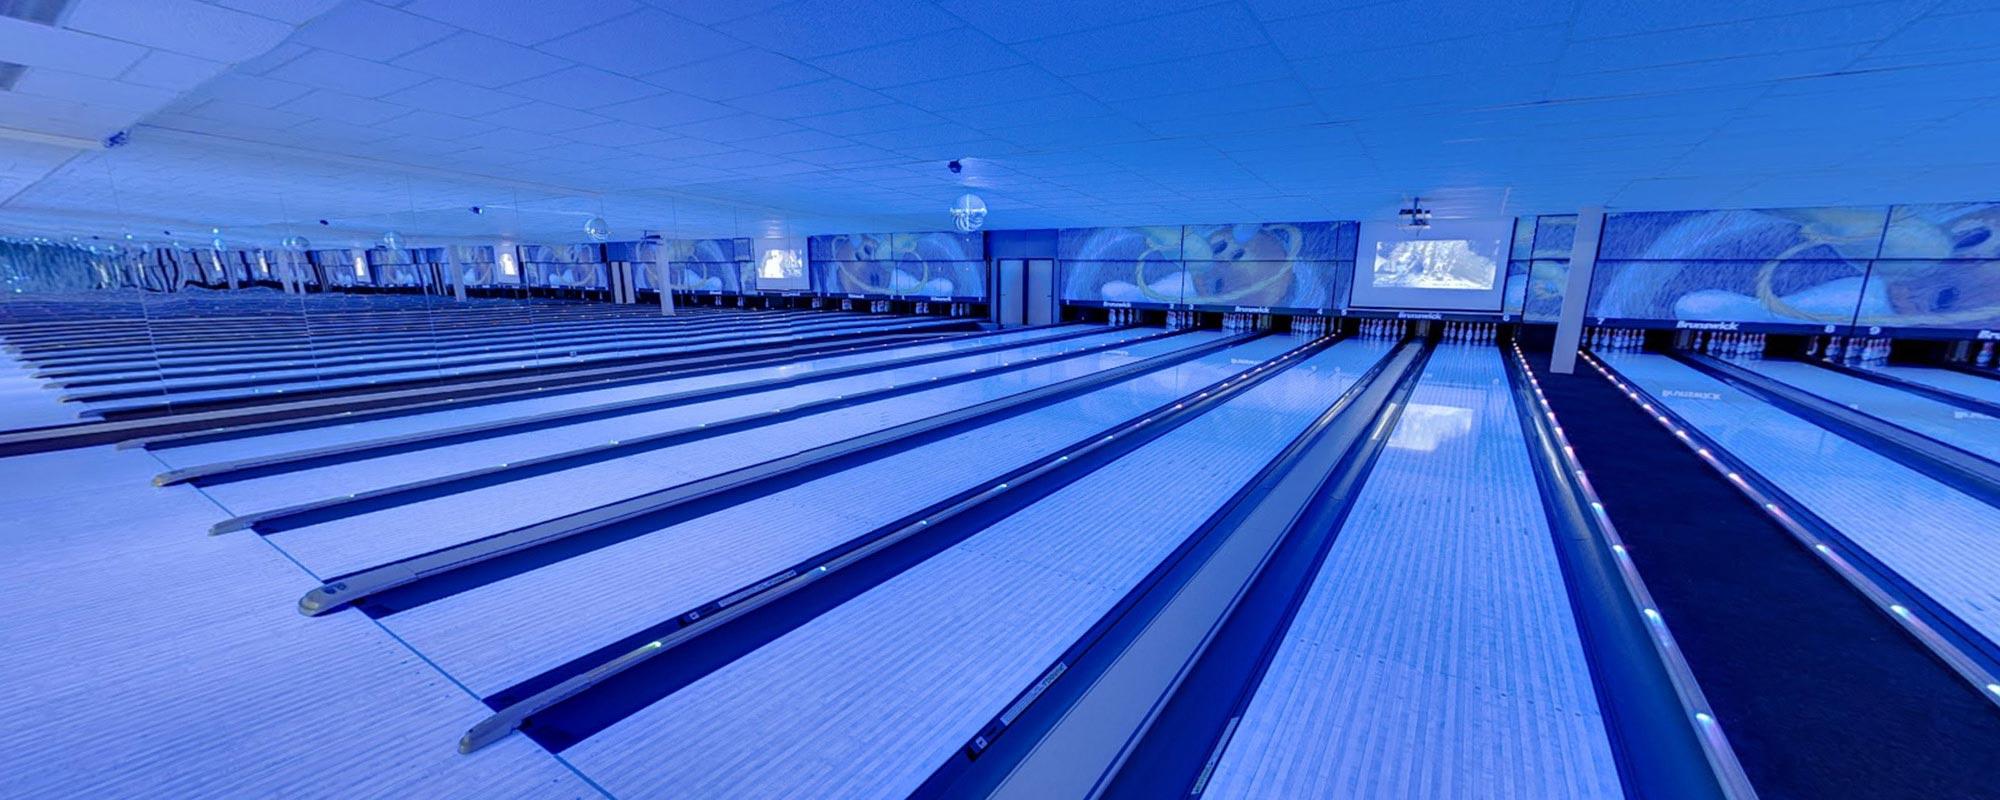 ebafkc-bowling-2000x800-03